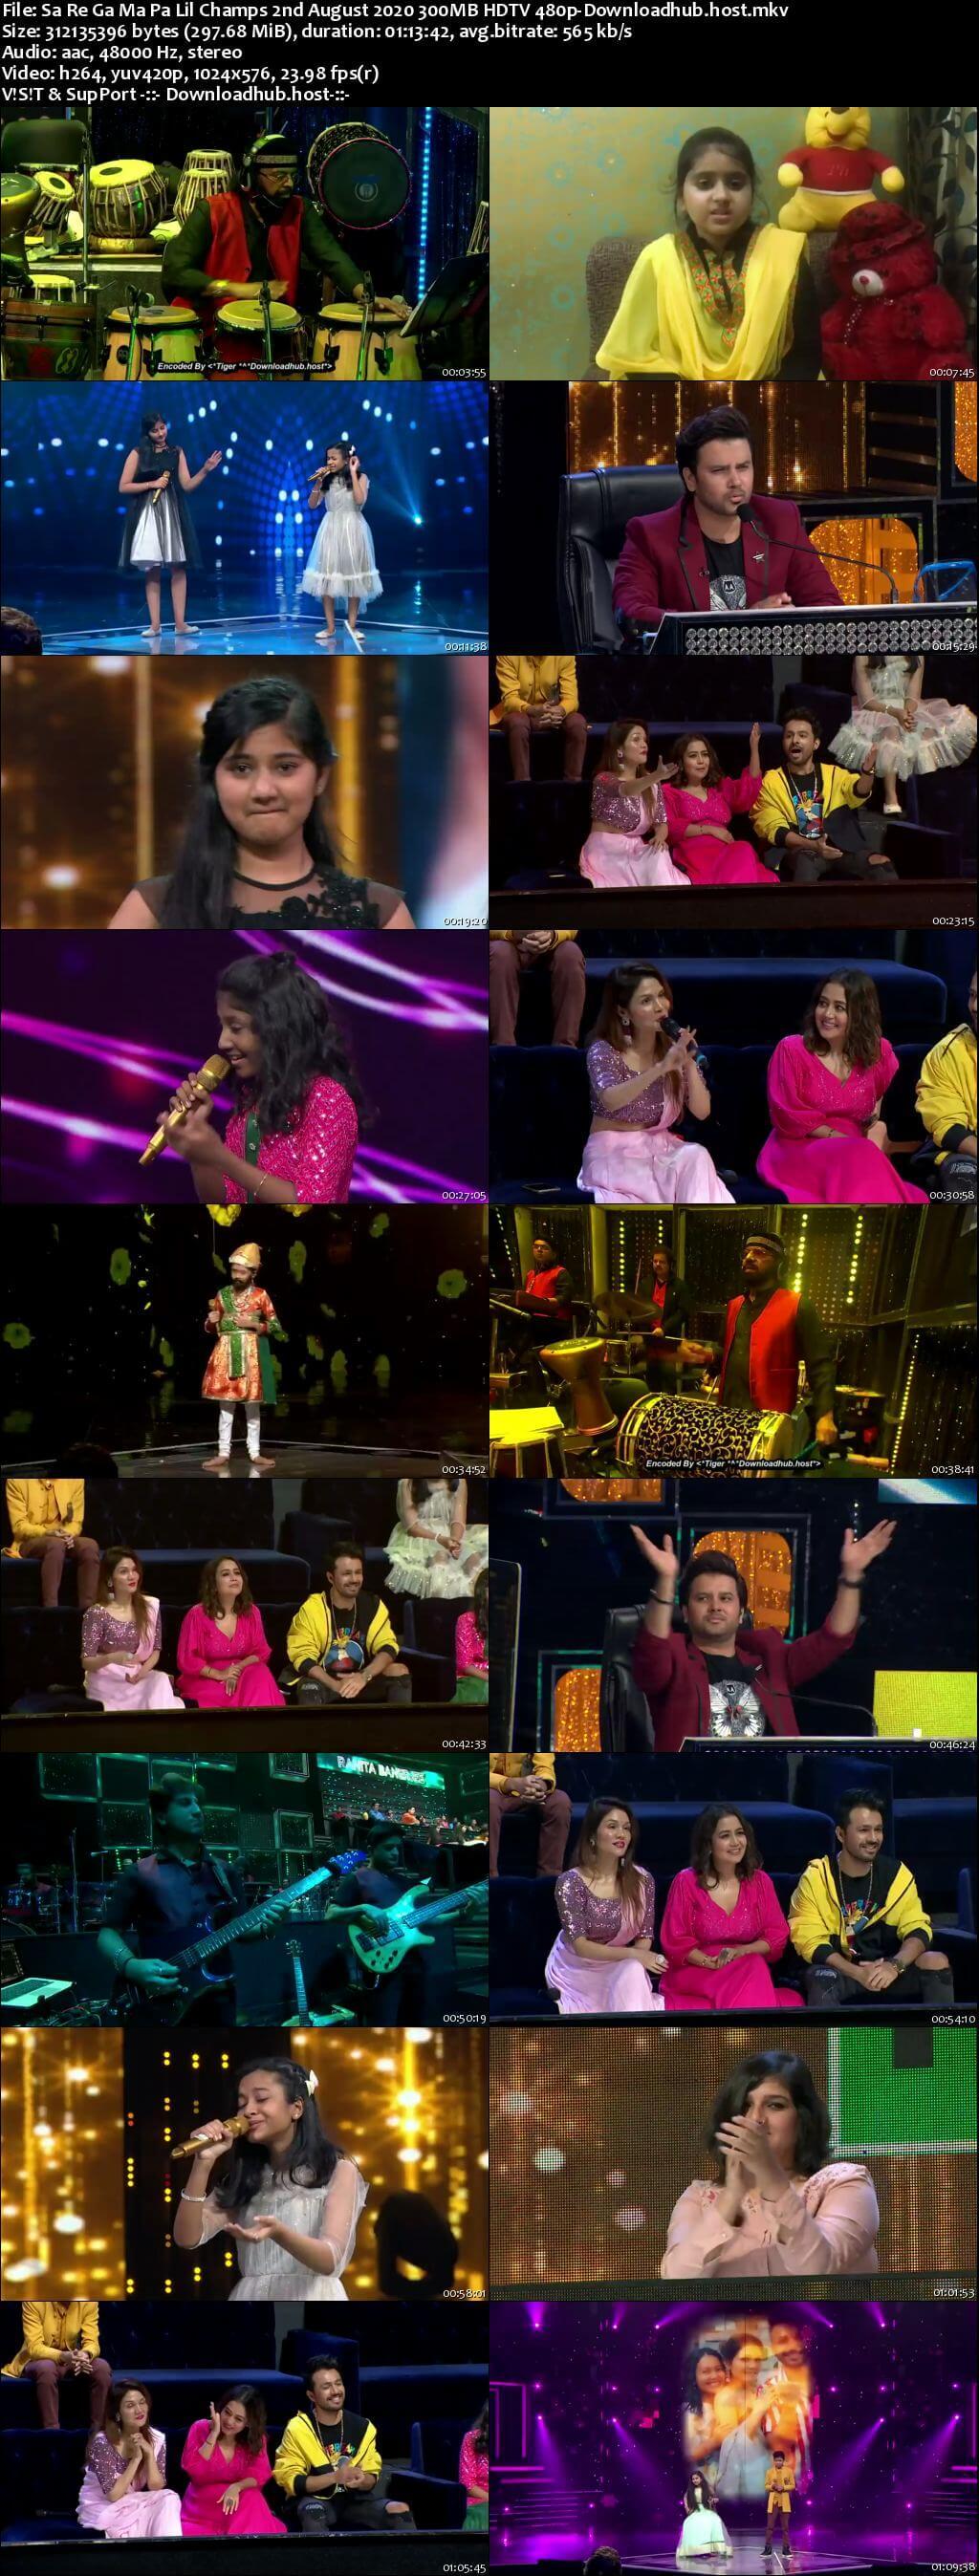 Sa Re Ga Ma Pa Lil Champs 02 August 2020 Episode 14 HDTV 480p